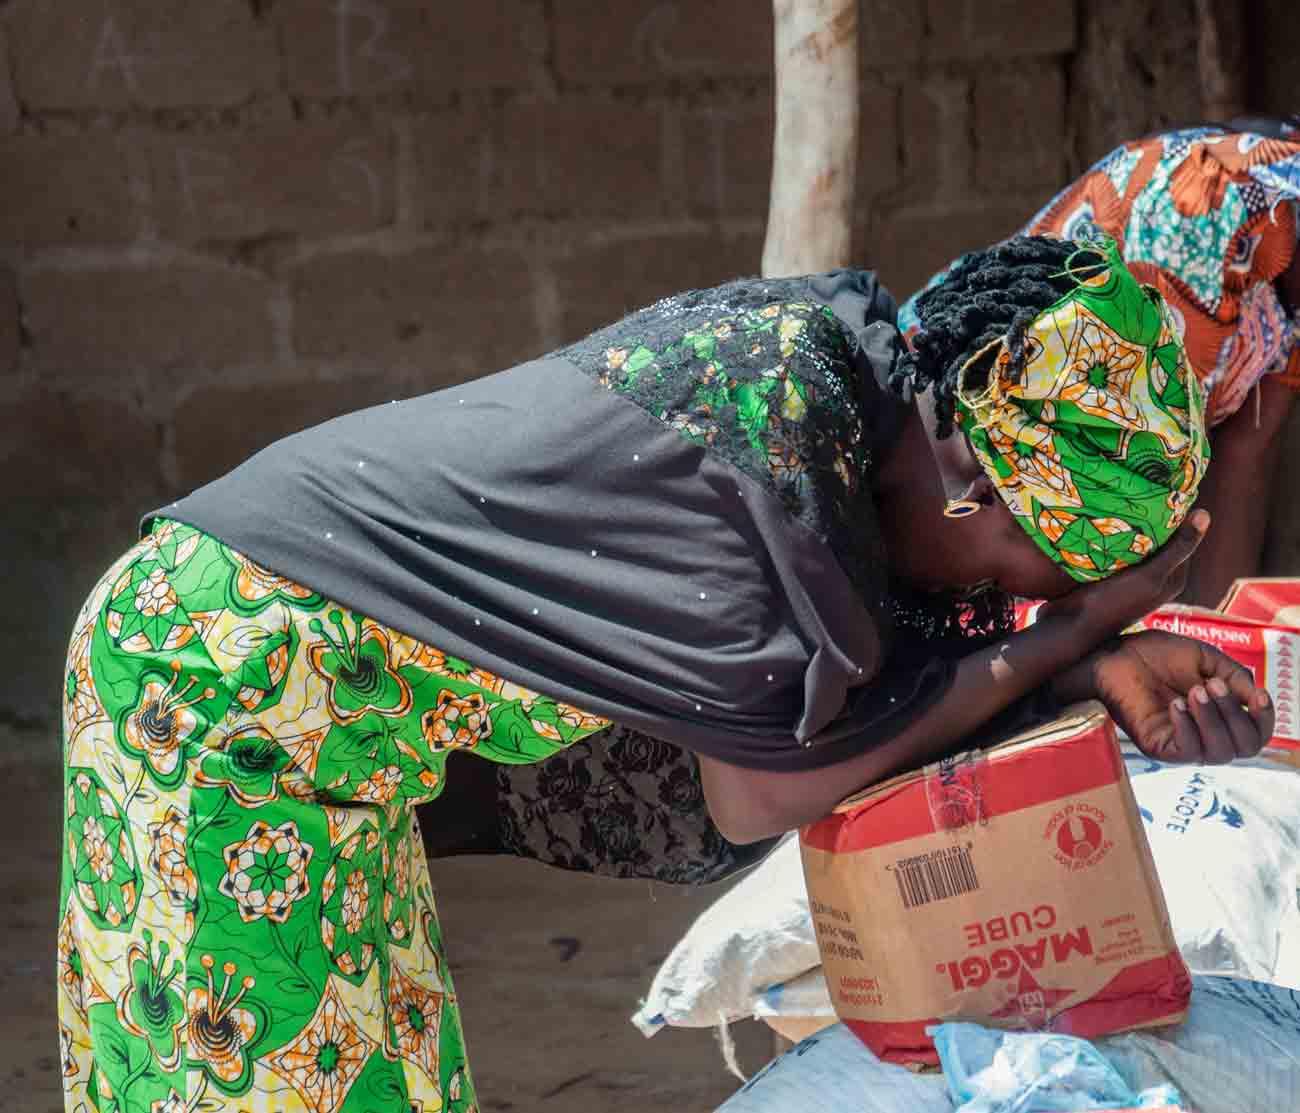 Militant Fulani Muslims kill 20 villagers, seven college students